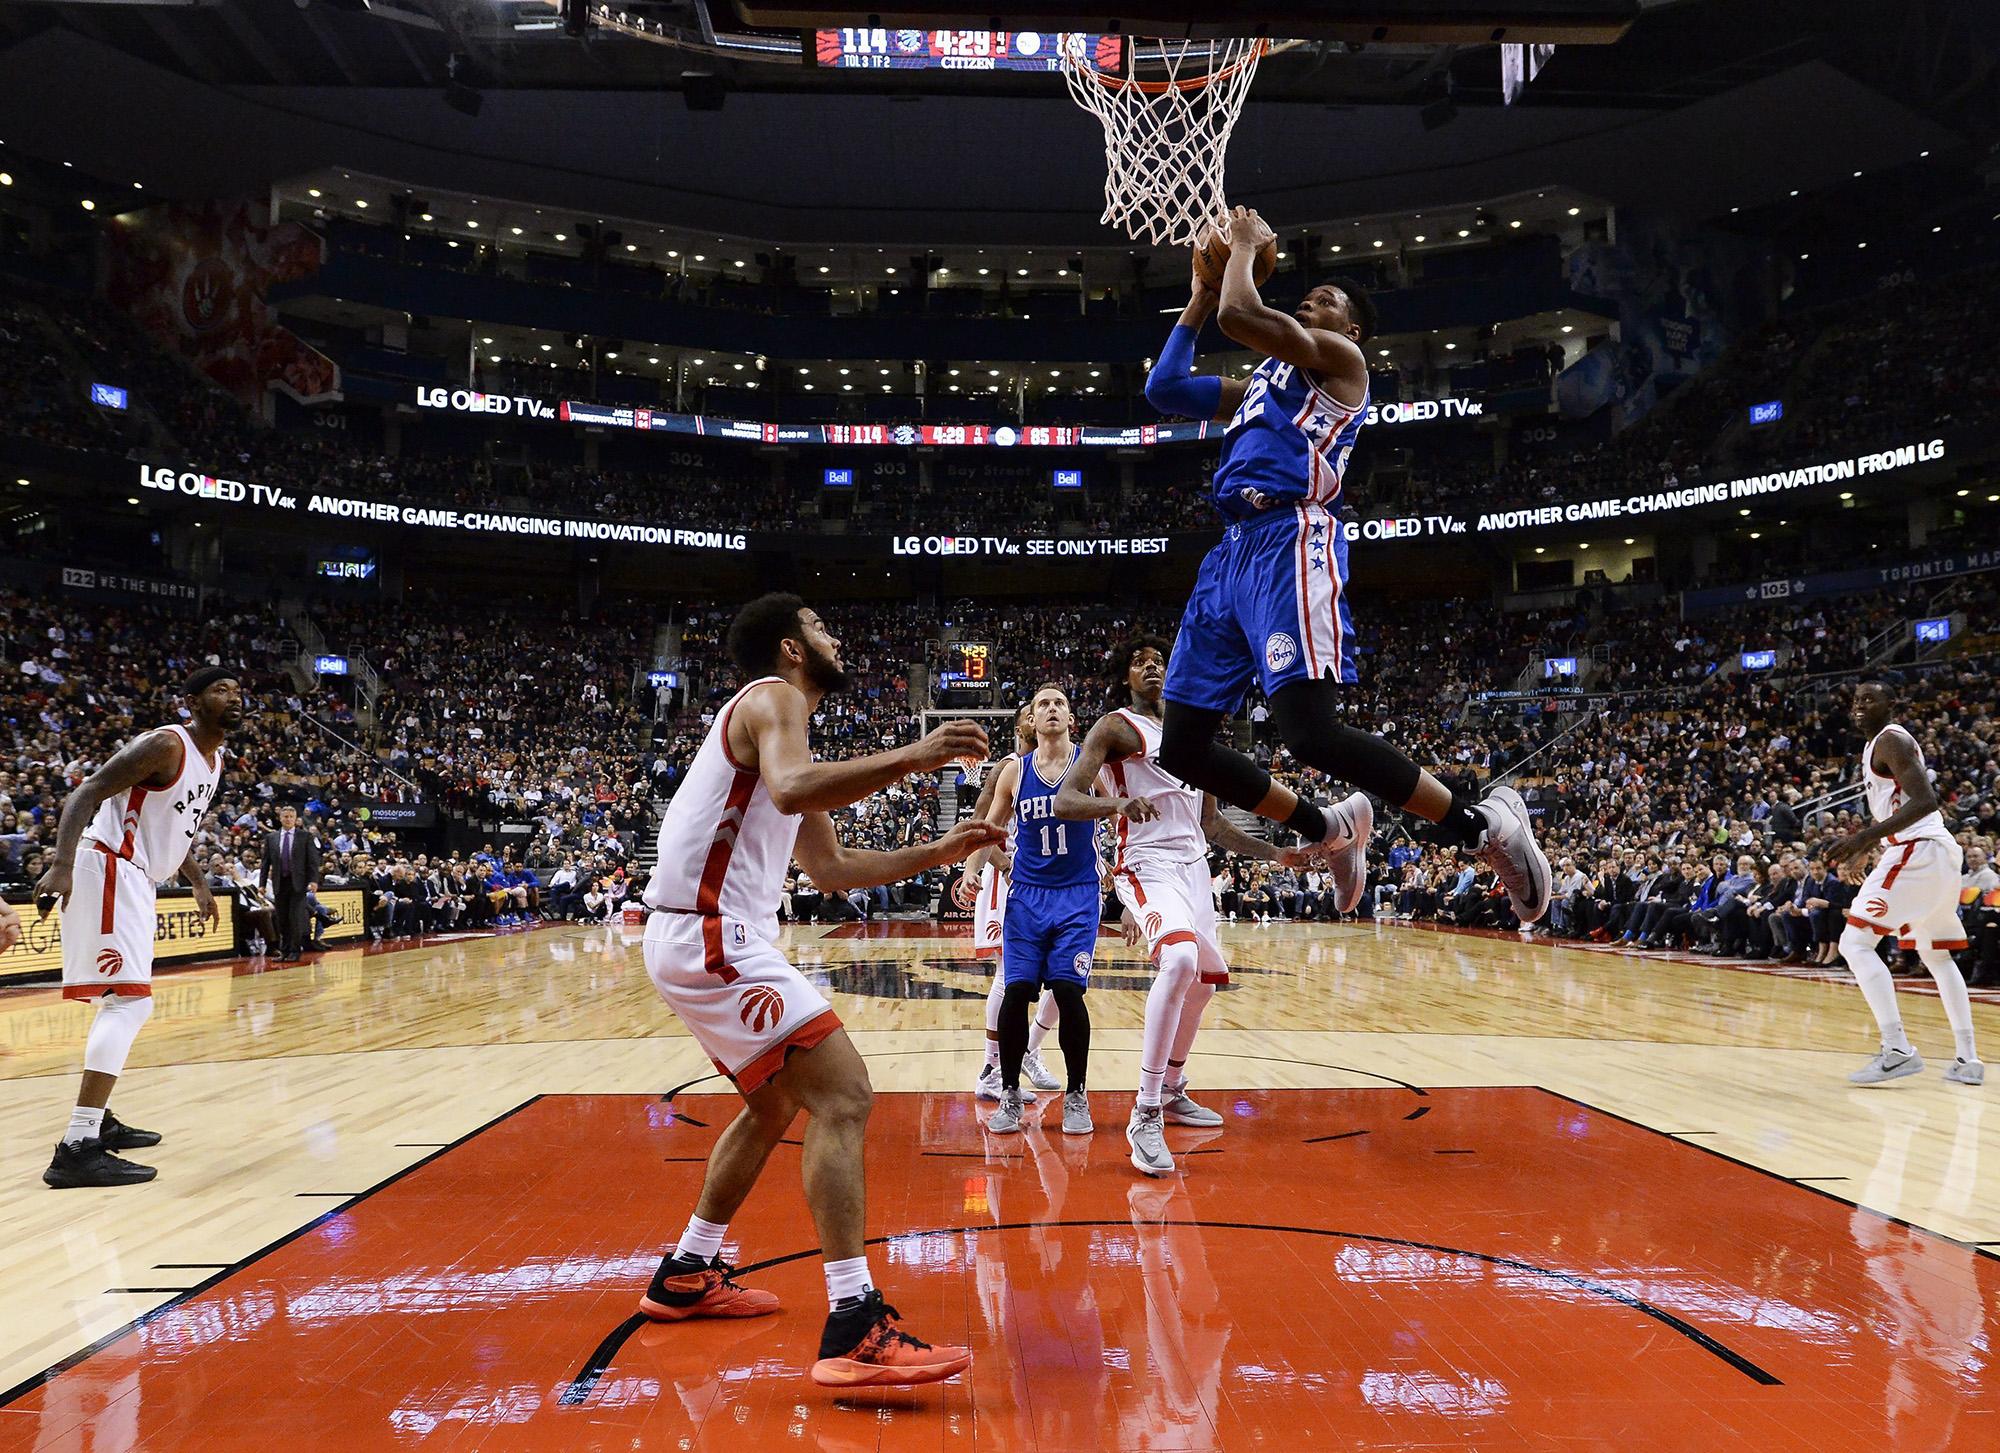 Philadelphia  76ers forward Richaun Holmes (22) goes up for a dunk shot past Toronto Raptors guard Cory Joseph (6) during the second half of an NBA basketball game in Toronto on Monday, Nov. 28, 2016. (Nathan Denette/AP)